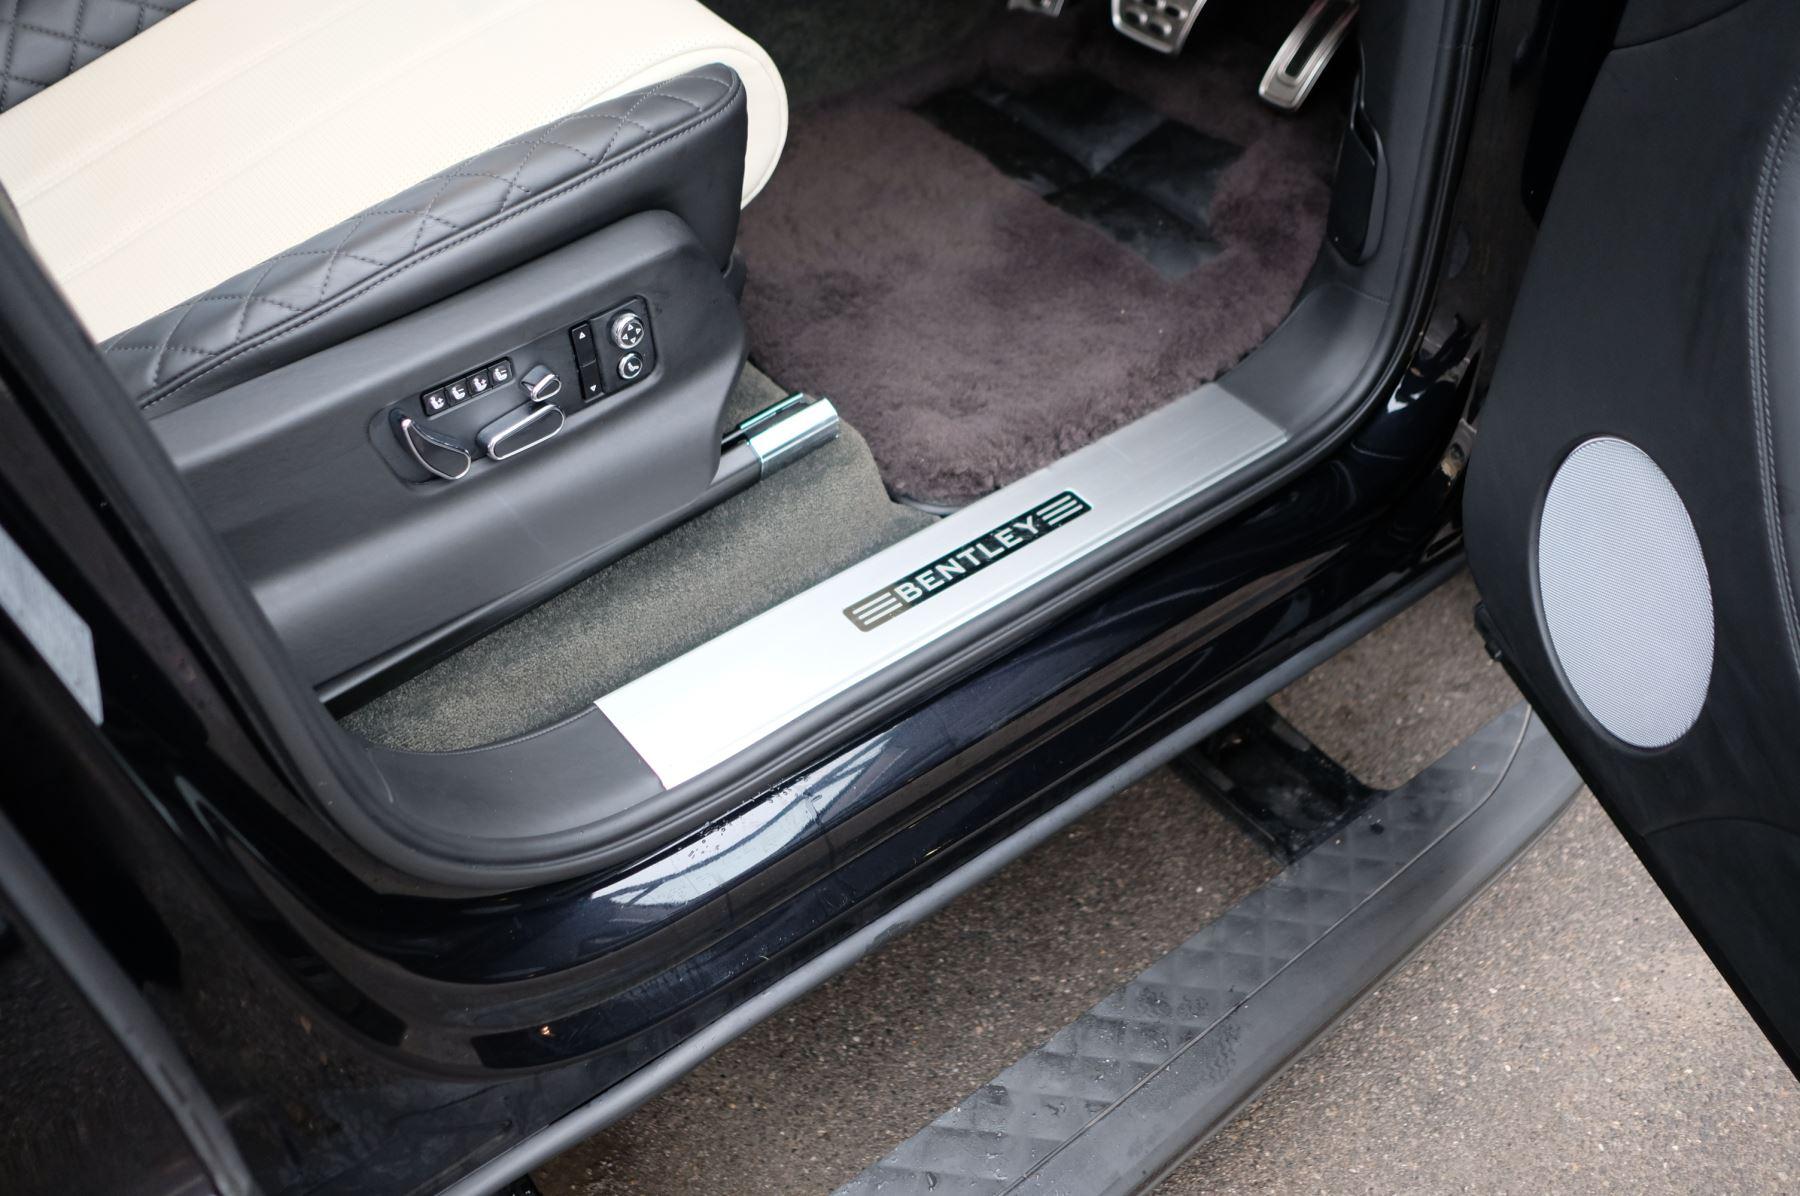 Bentley Bentayga Diesel 4.0 V8 Mulliner Driving Spec 5dr Auto - 7 Seat Specification image 17